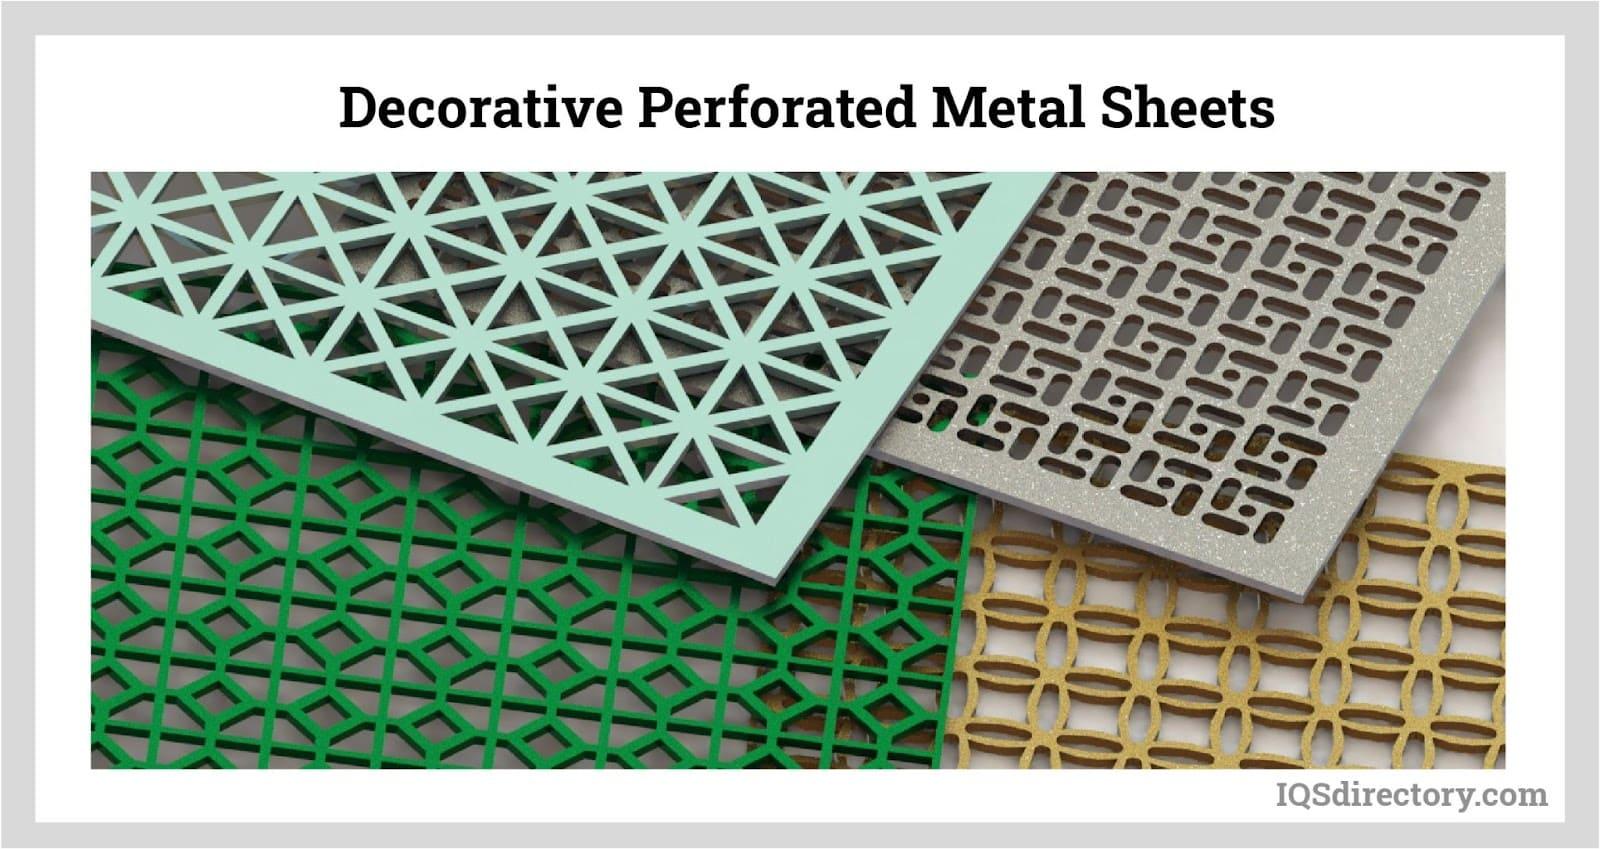 Decorative Perforated Metal Sheets